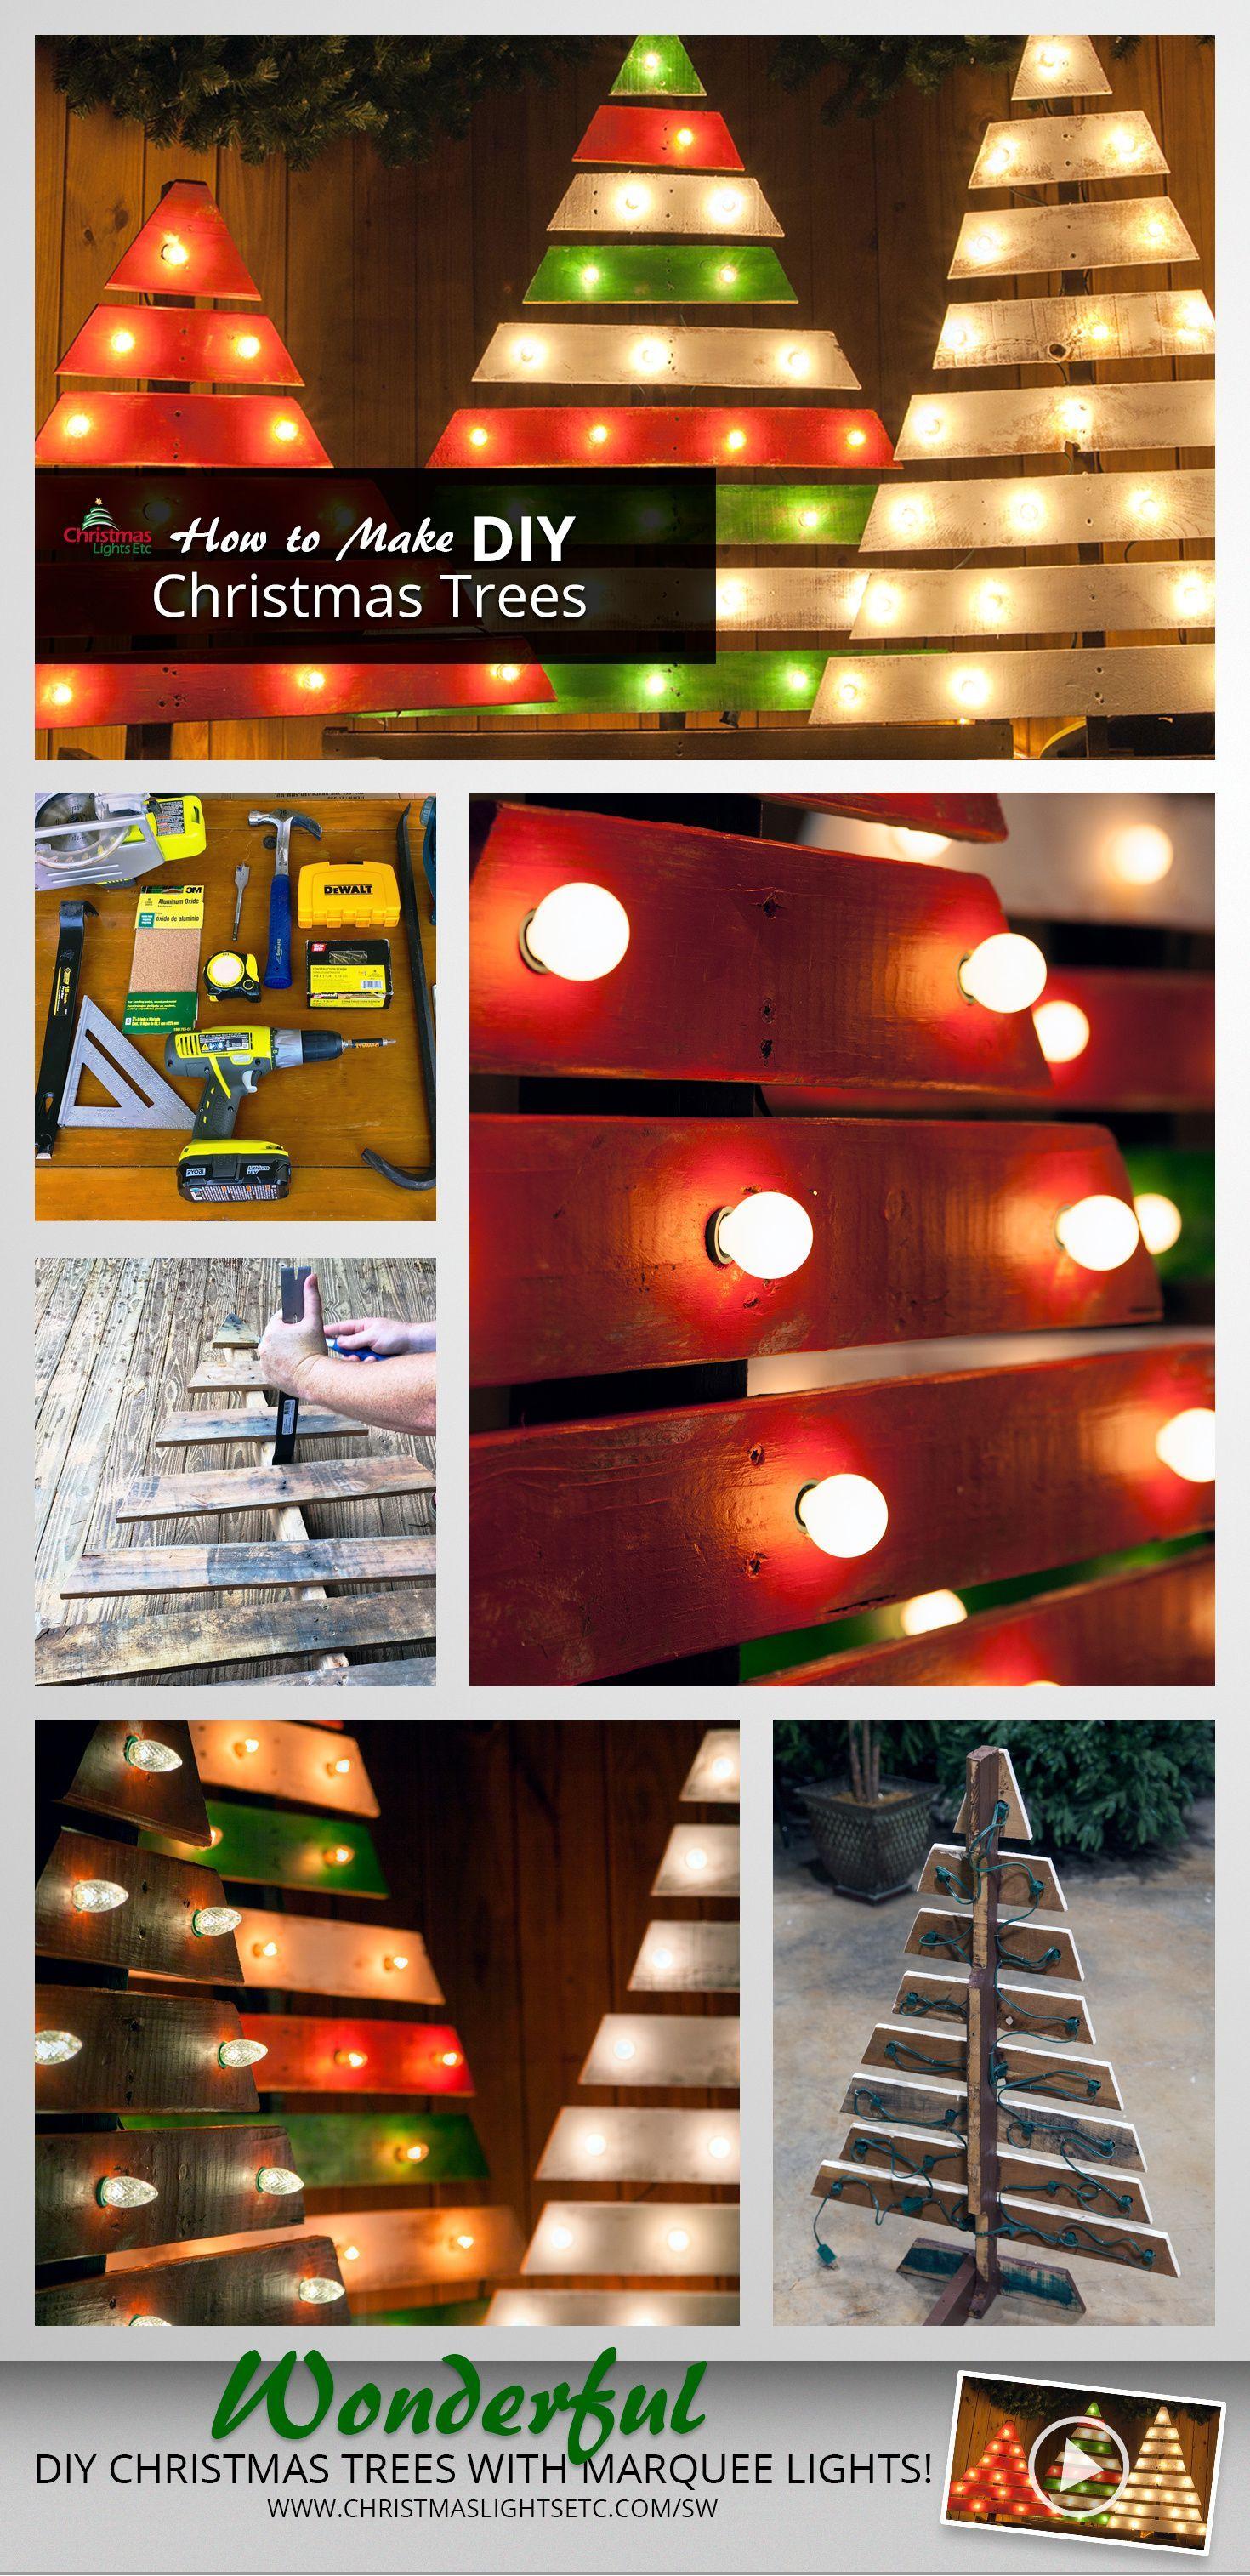 Diy outdoor christmas decorations  DIY Christmas Trees With Marquee Lights  Diy outdoor christmas